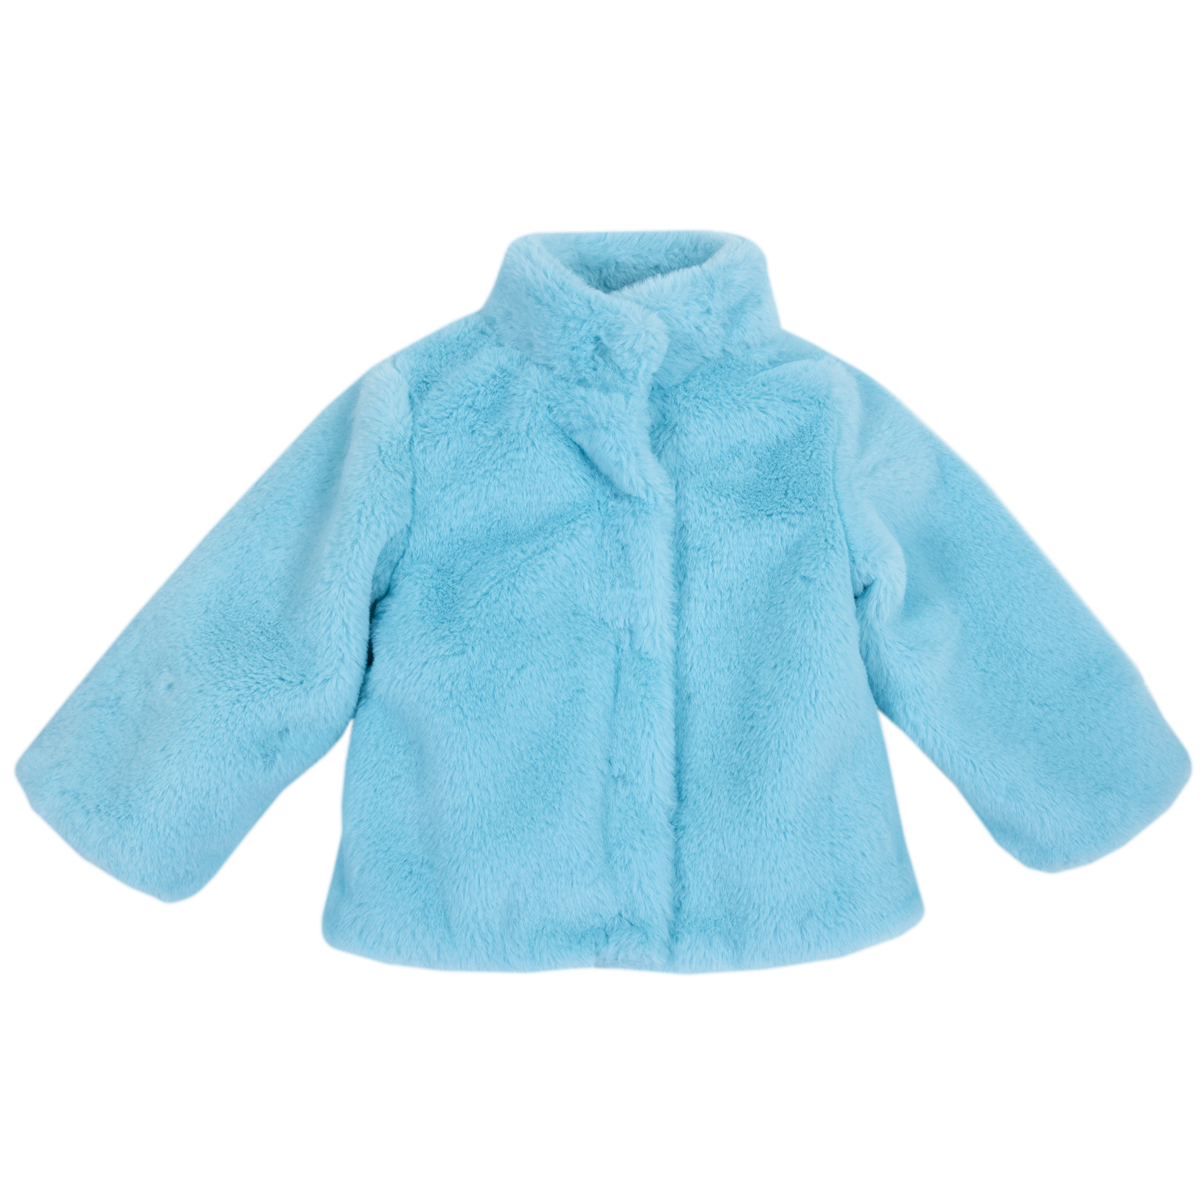 Jacheta copii Chicco, blanita artificiala, turcoaz, 87025 din categoria Jachete copii